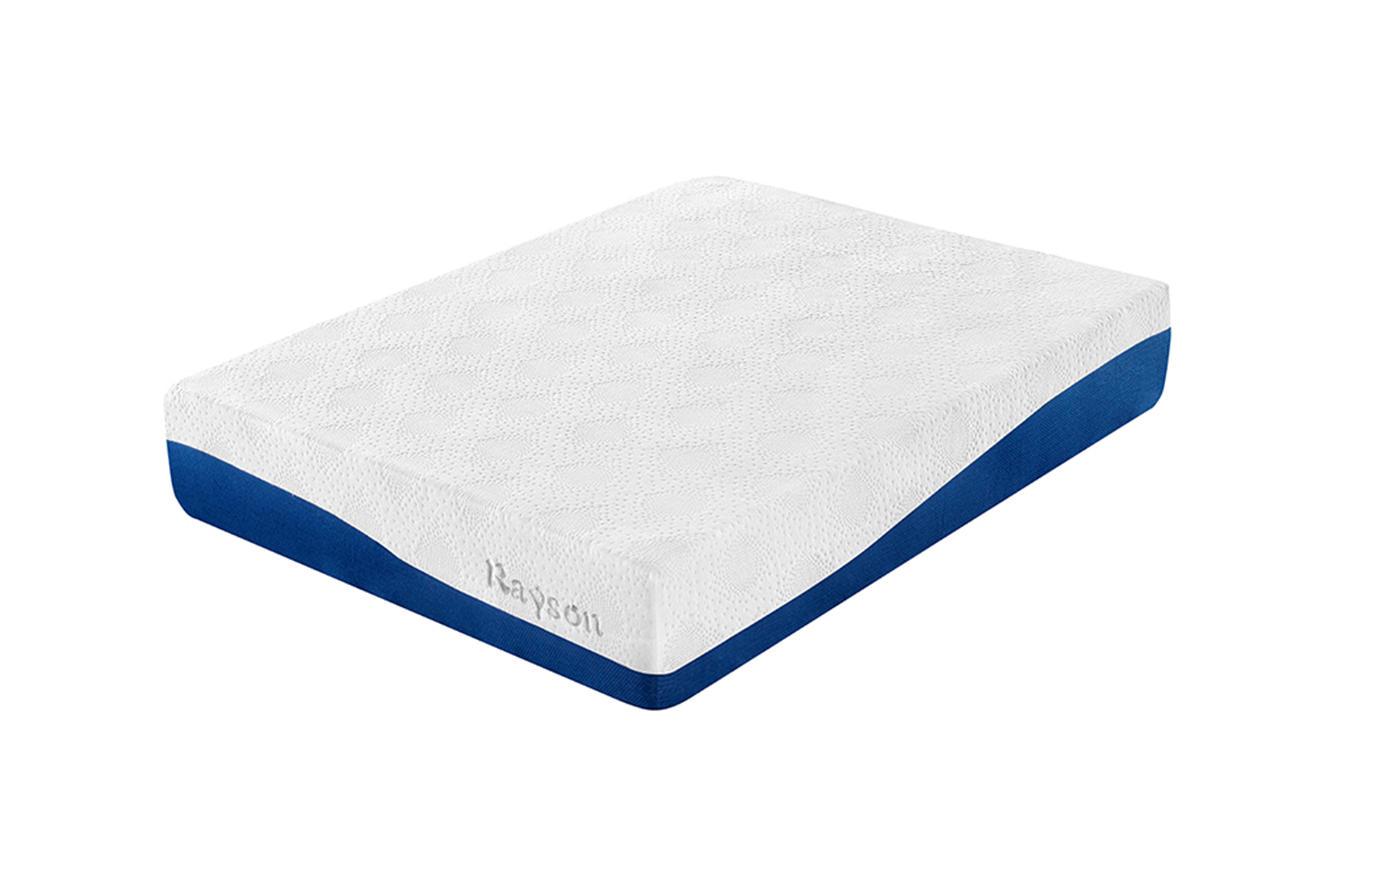 Synwin hotel luxury memory foam mattress bulk order-1